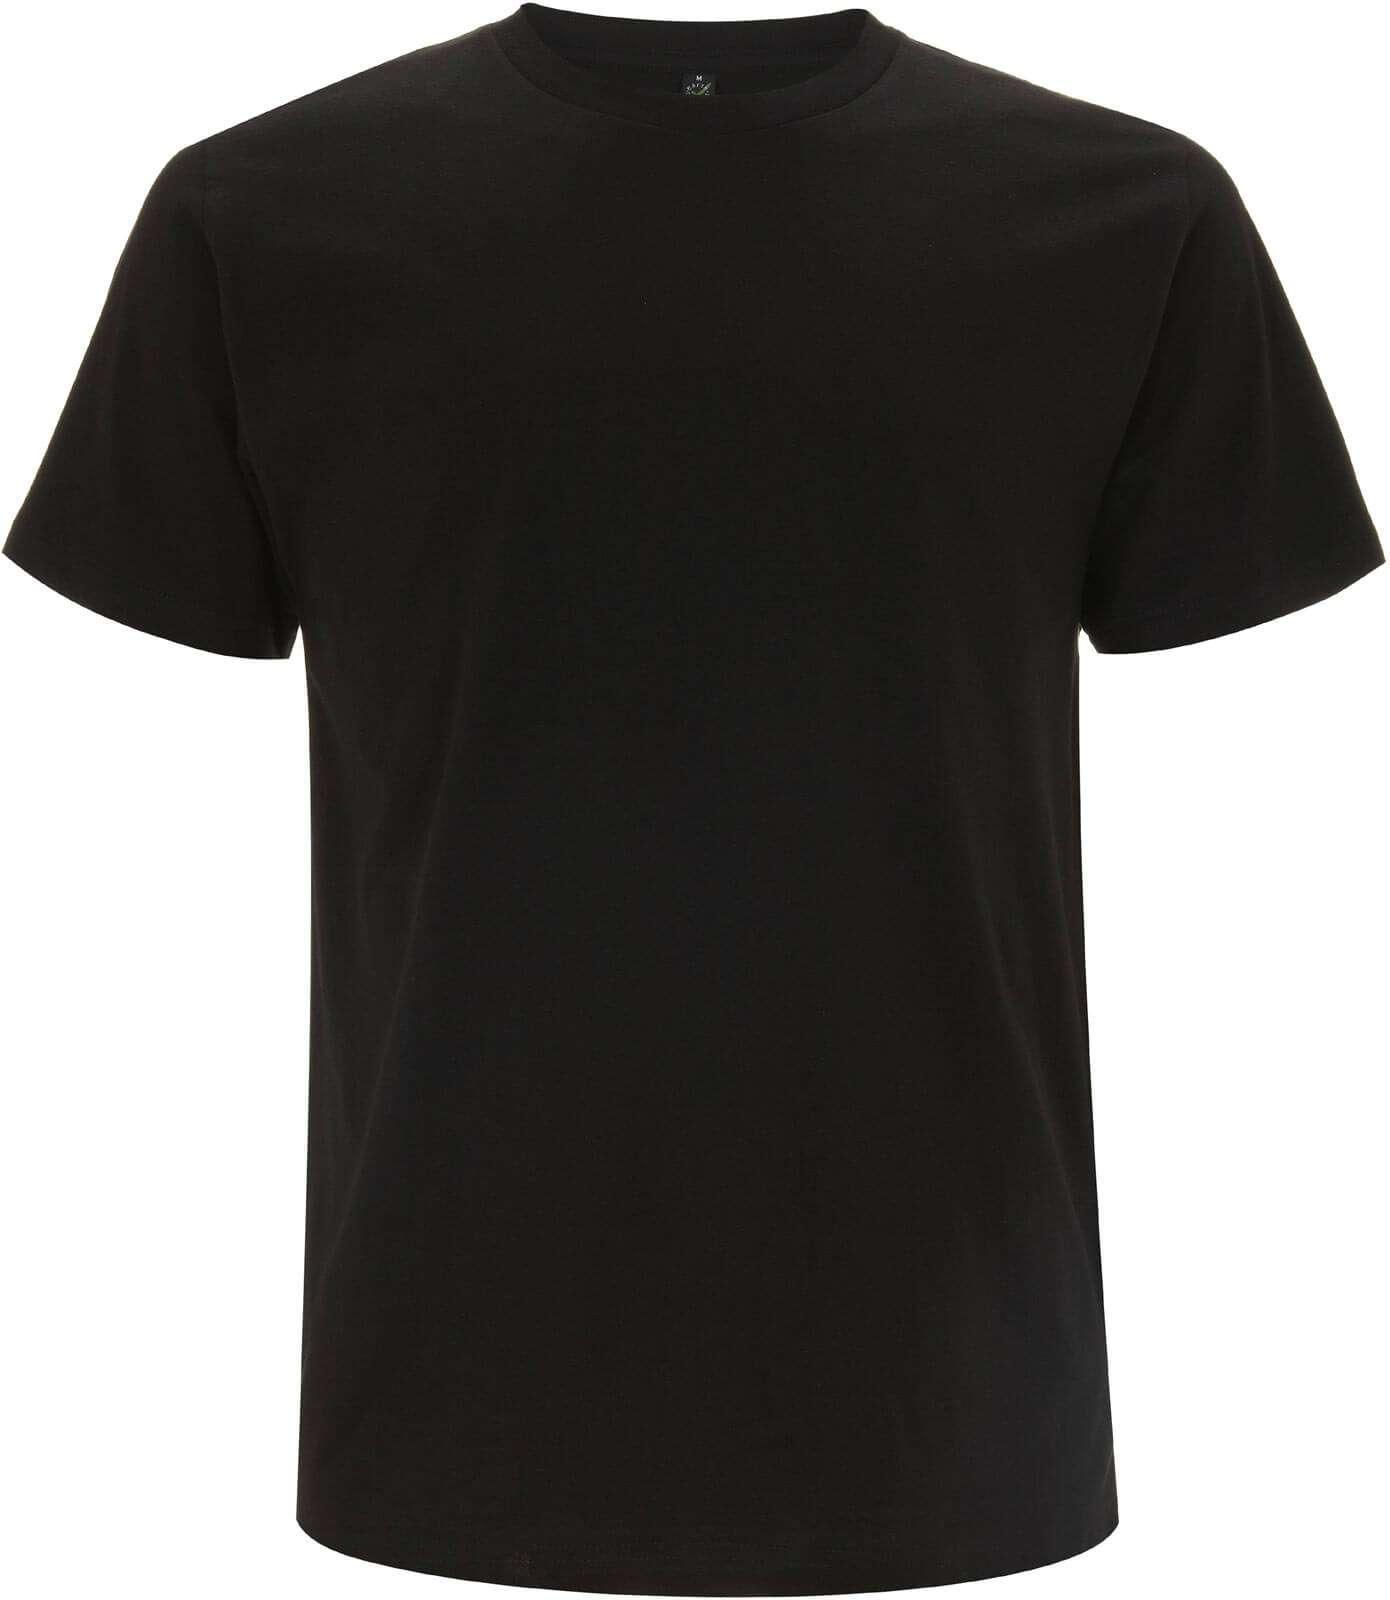 9ac0a6b63bee37 Fair Trade Kleidung   Basic Mode aus Bio-Baumwolle online ...